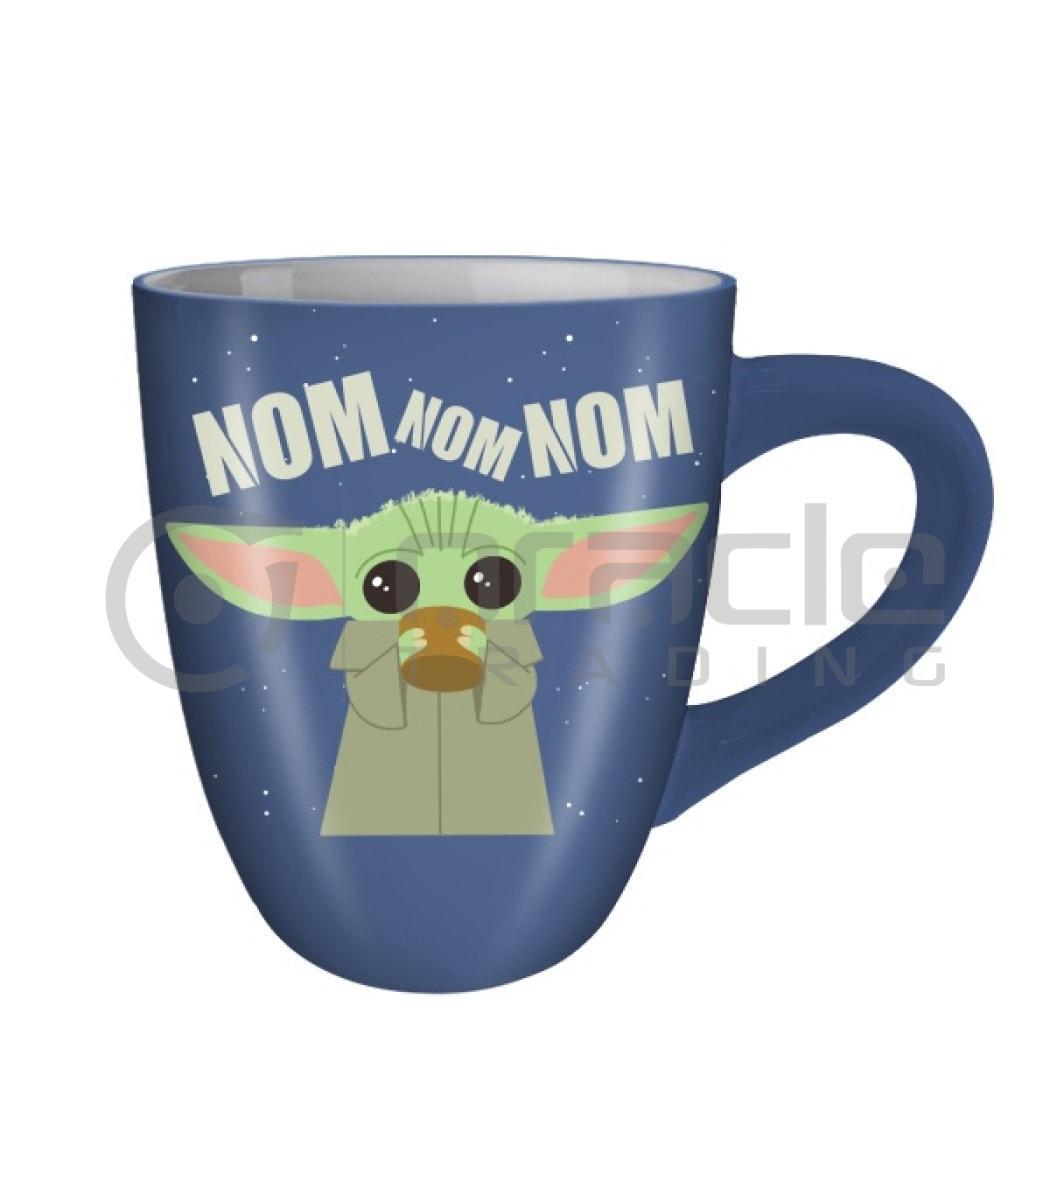 Star Wars: The Mandalorian Jumbo Tall Mug - The Child